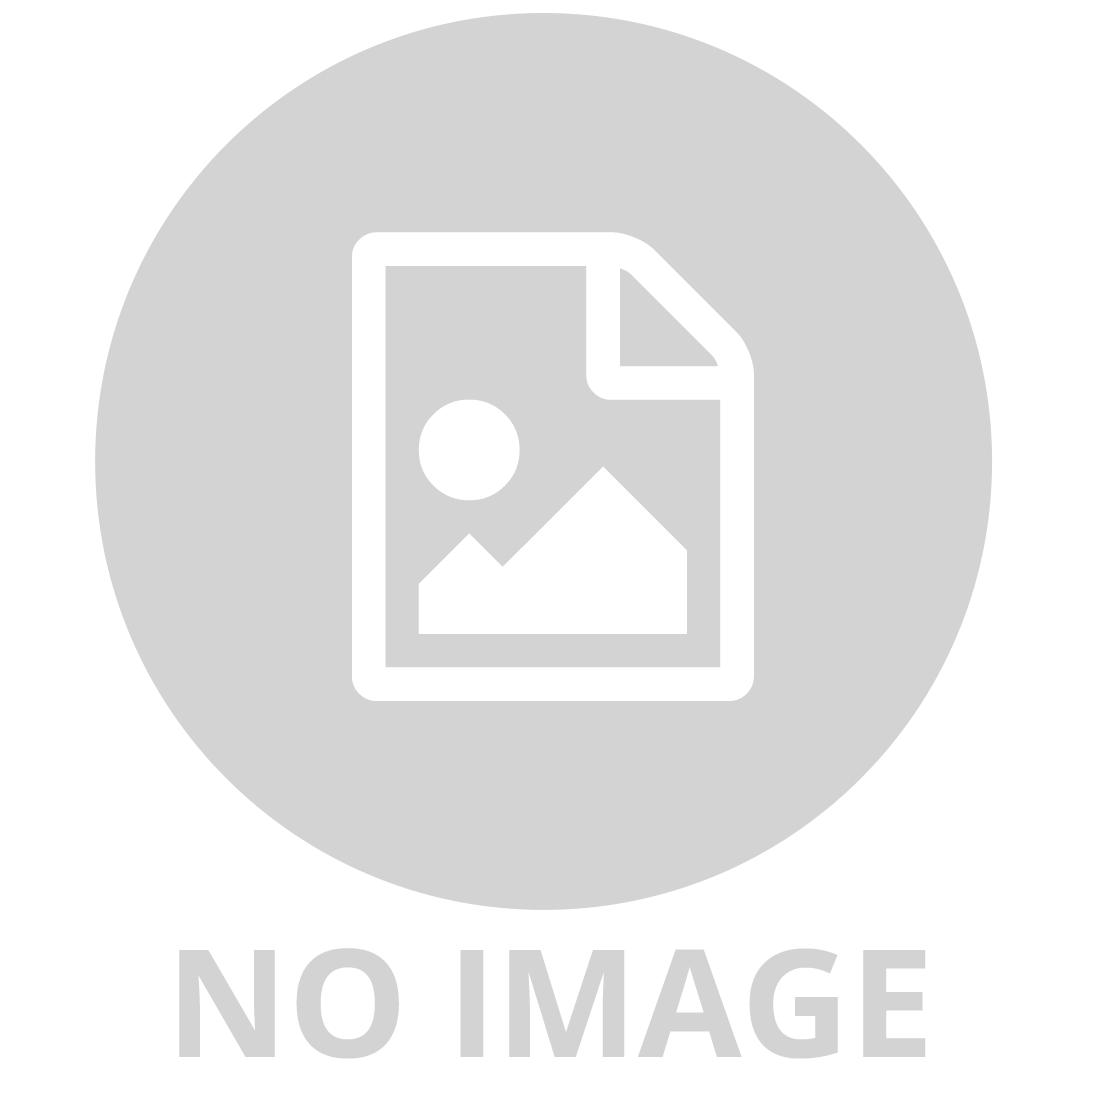 LEGO CITY 60262 PASSENGER AIRPLANE